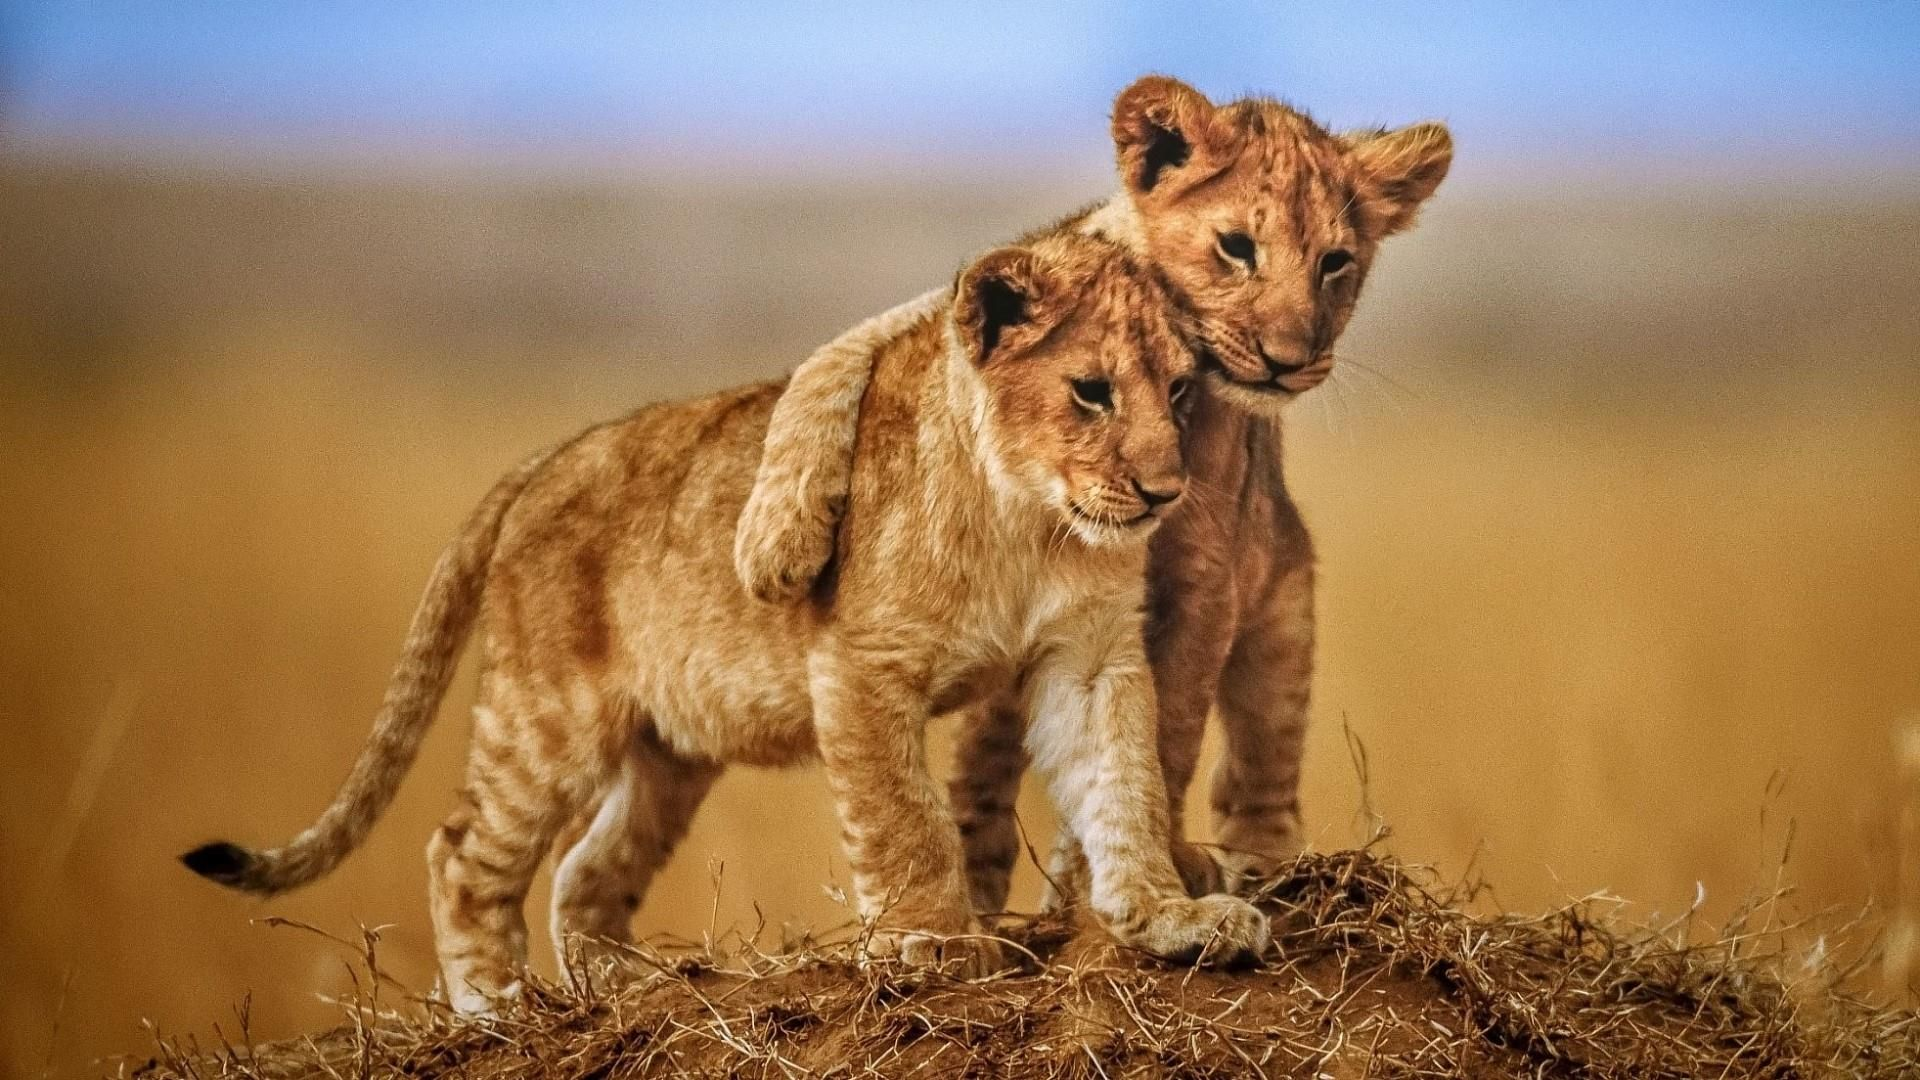 Cute Lion Cubs Wallpaper Animals Animals Beautiful Lion Photography